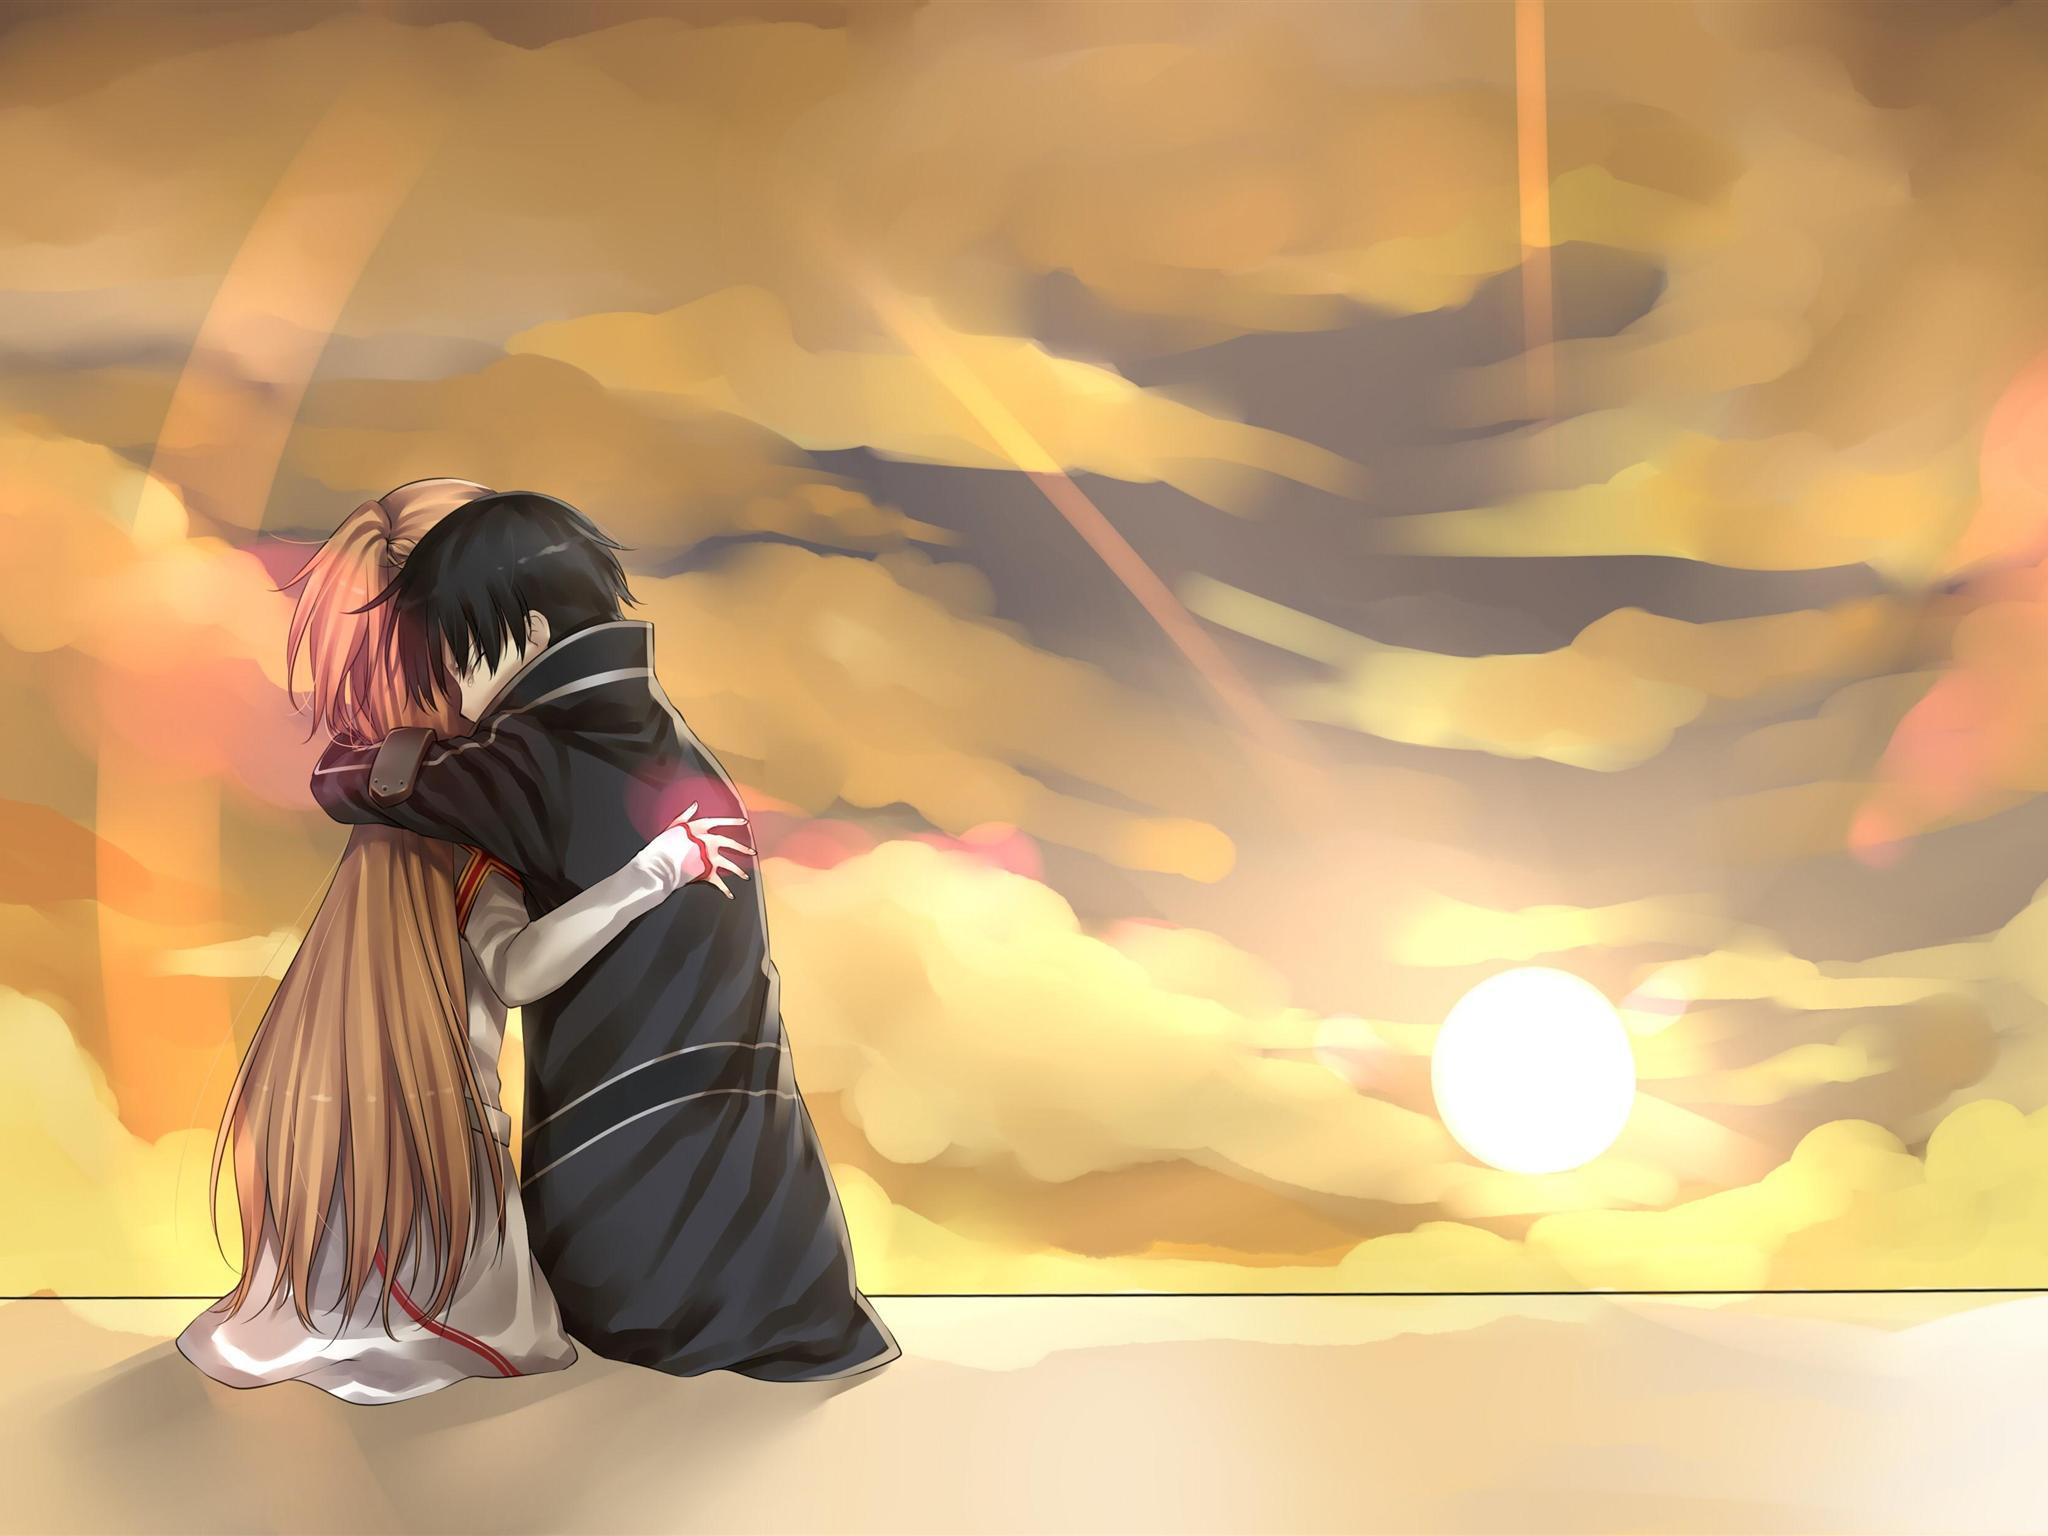 Sword Art Online 2048x1536 Picture   Anime  Yuuki Asuna  HD Wallpaper